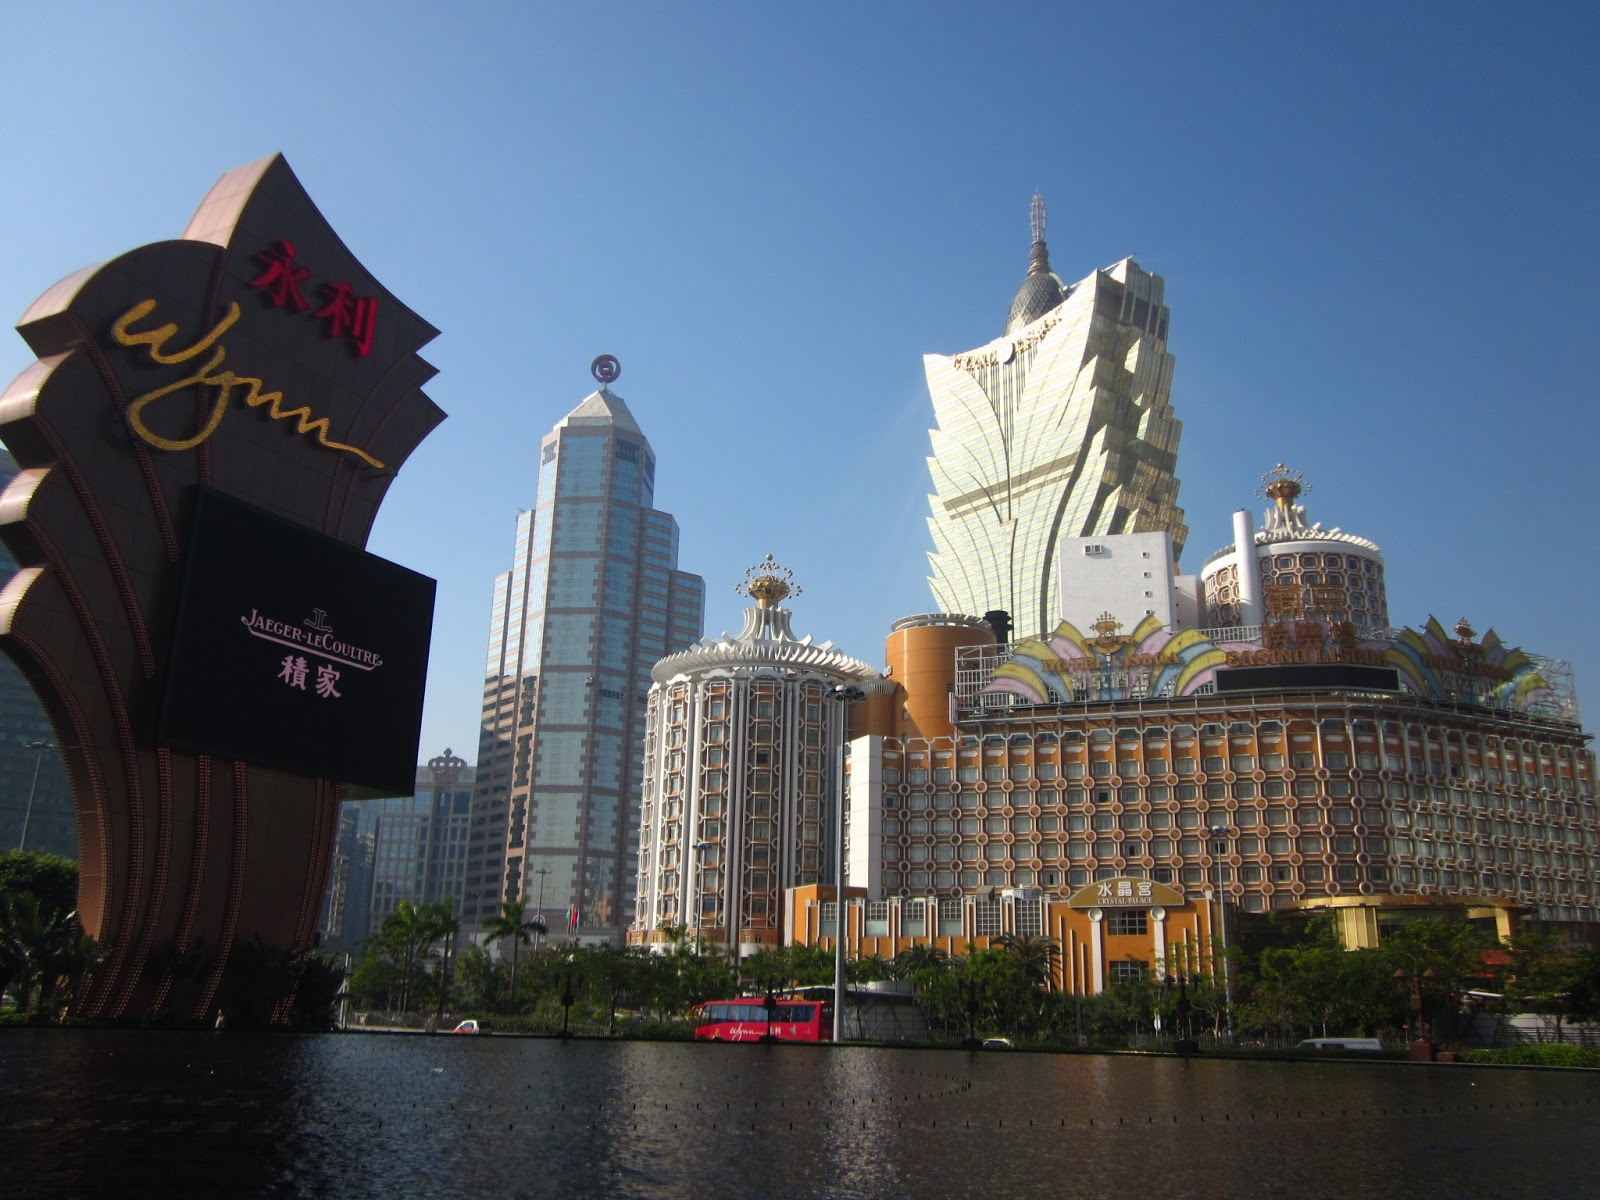 Name of macau casino in skyfall